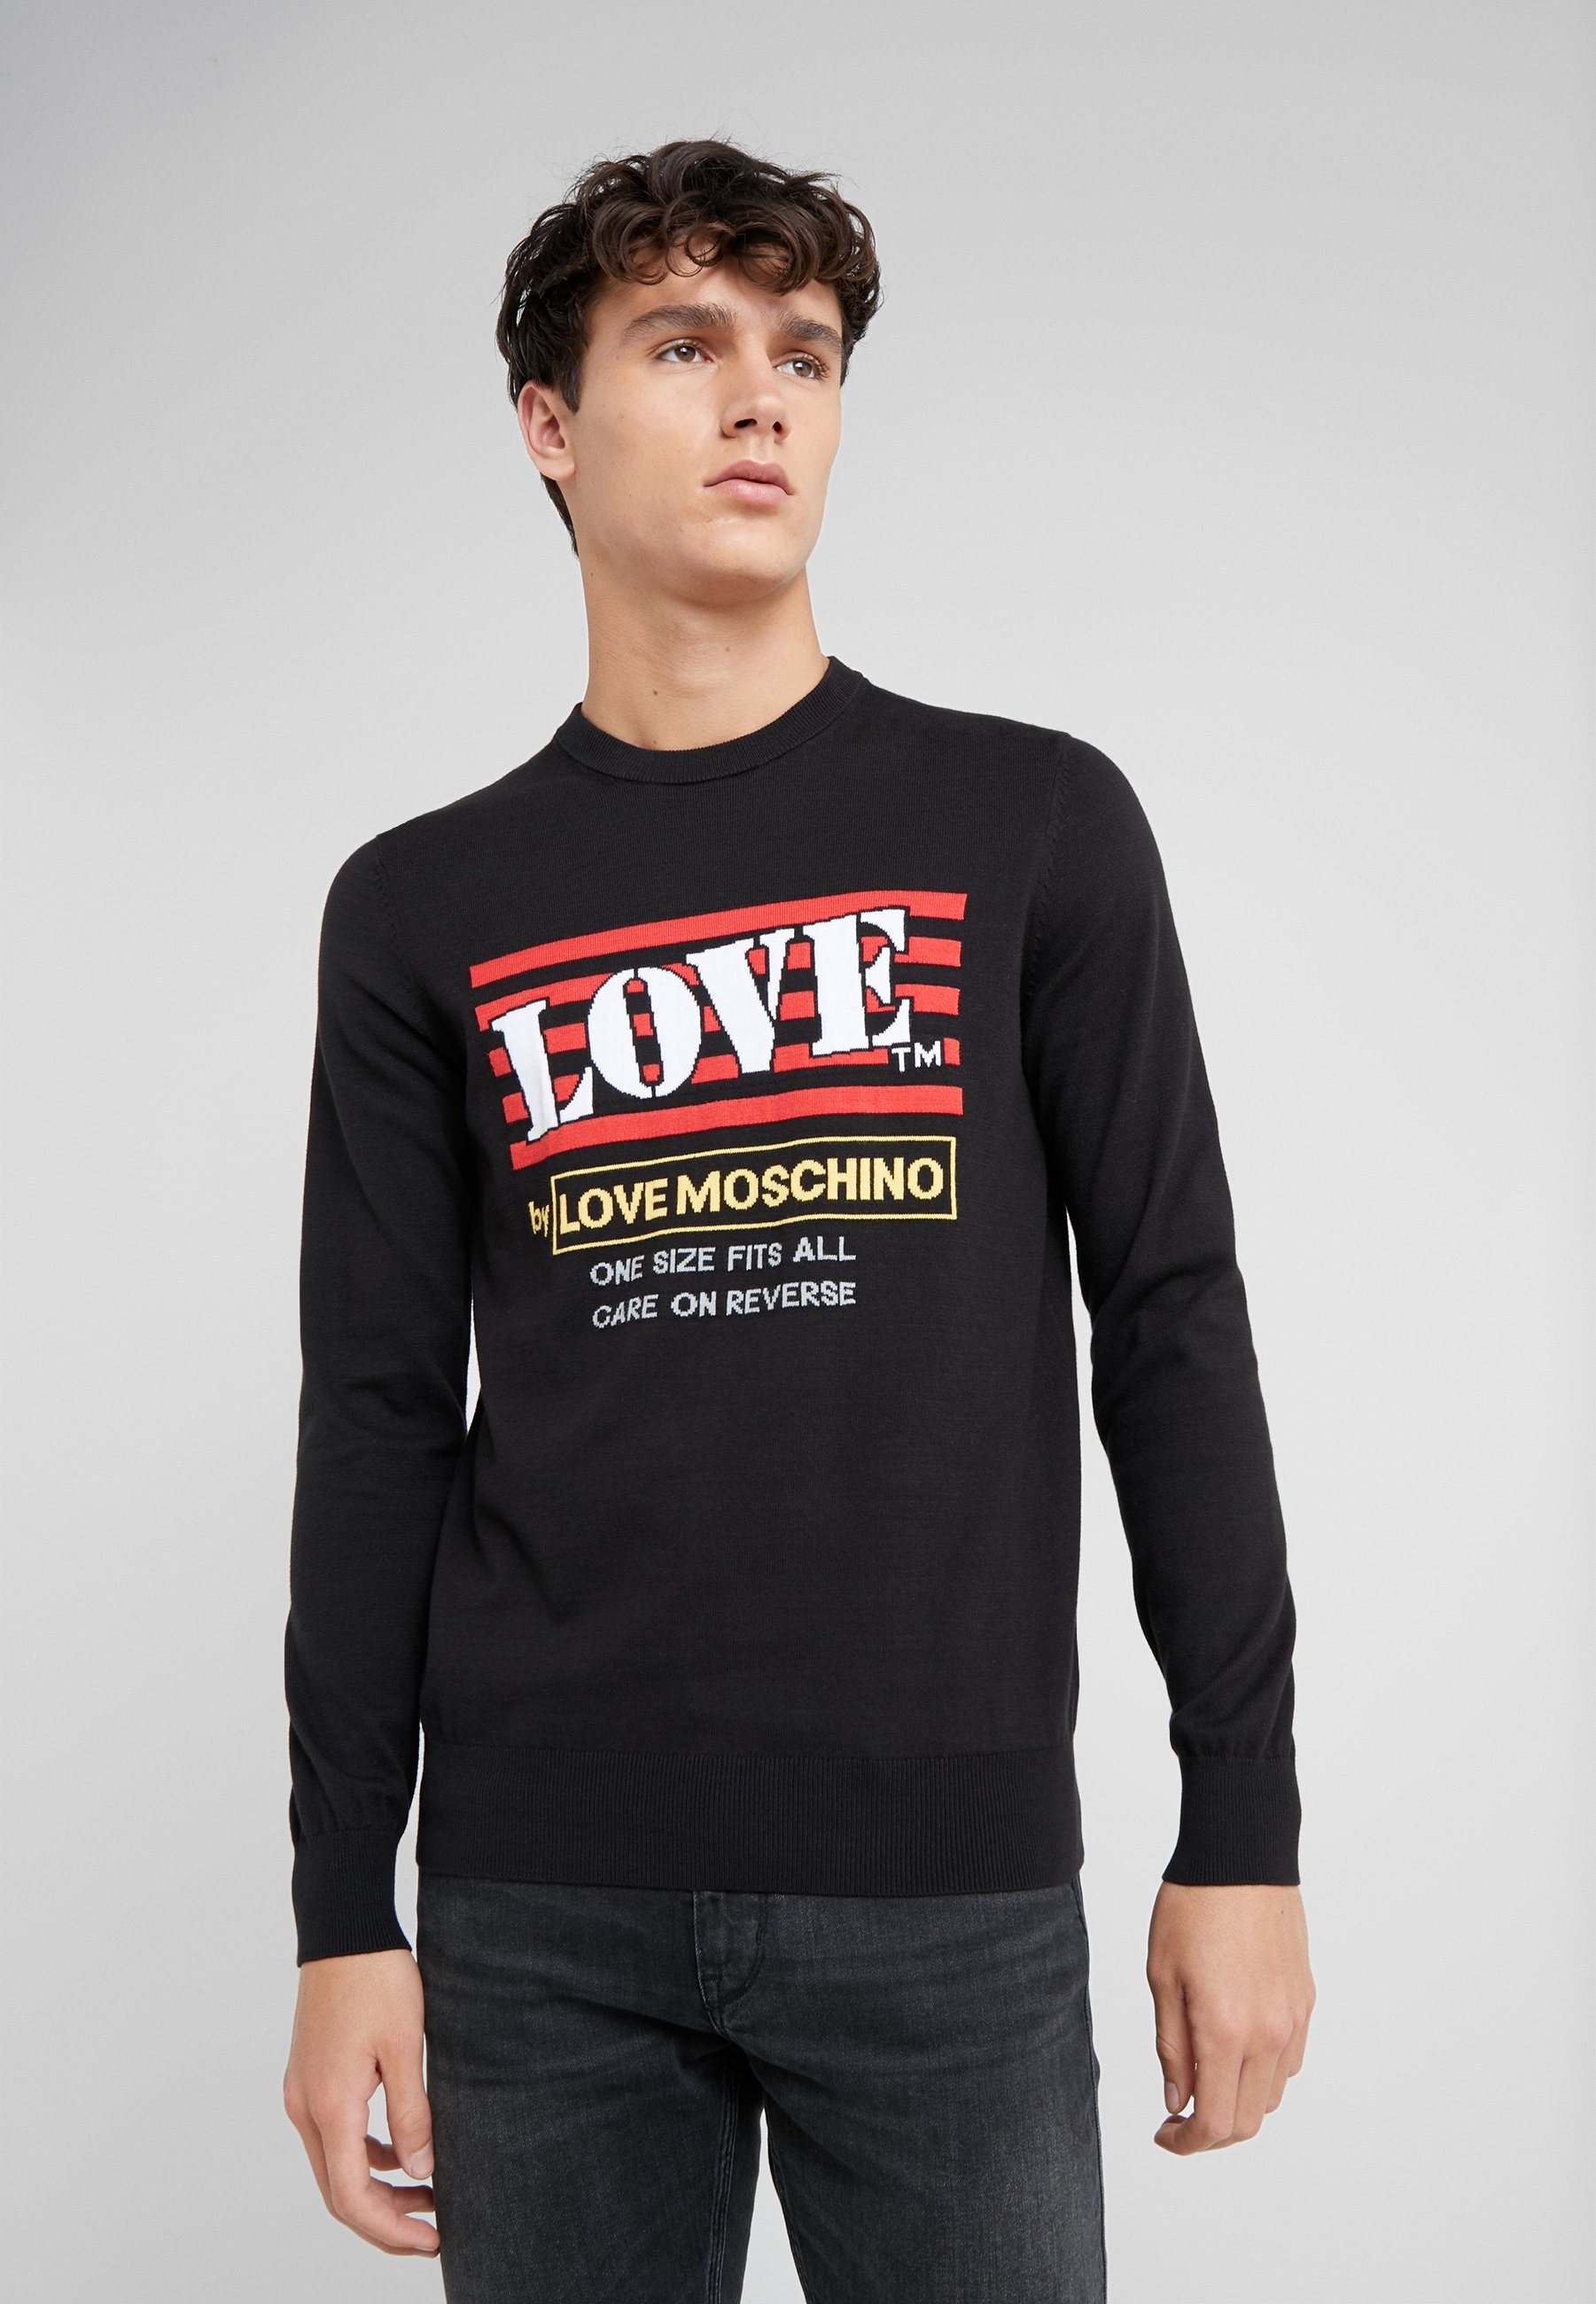 Love Love Moschino Moschino PulloverBlack PulloverBlack Moschino Moschino Love PulloverBlack PulloverBlack Love Love 8wXn0PkO